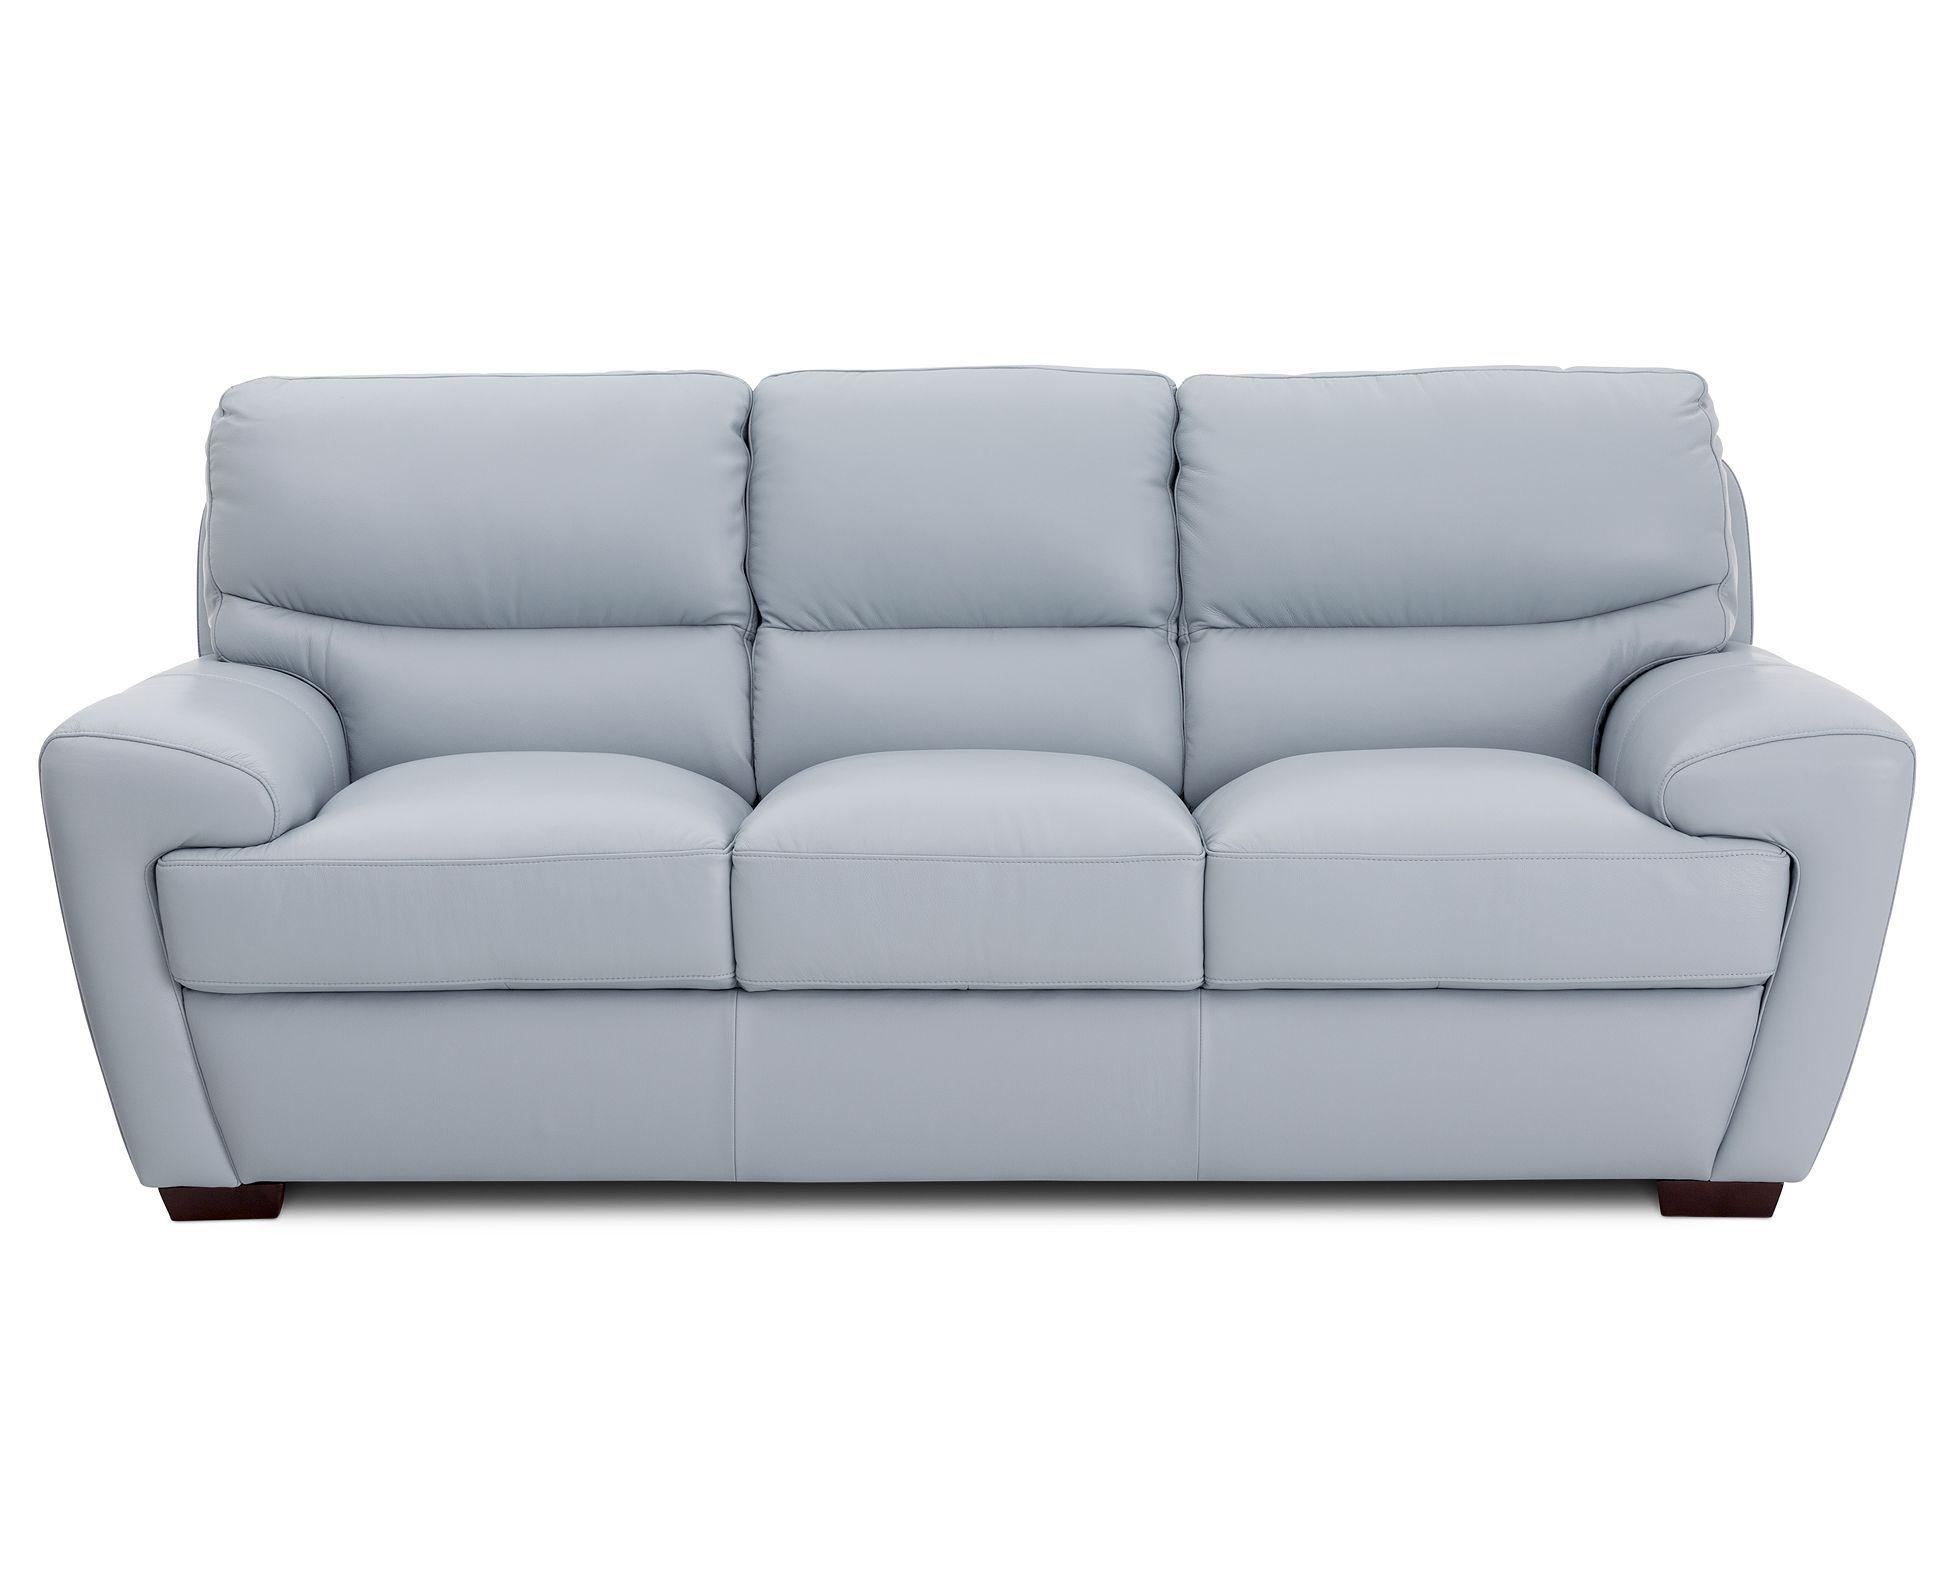 Fall For European Flair With The Sleek Modular Shape Of The Leather Papagiorgio Sofa In Your Choice Of Dark C Rowe Furniture European Home Decor European Decor